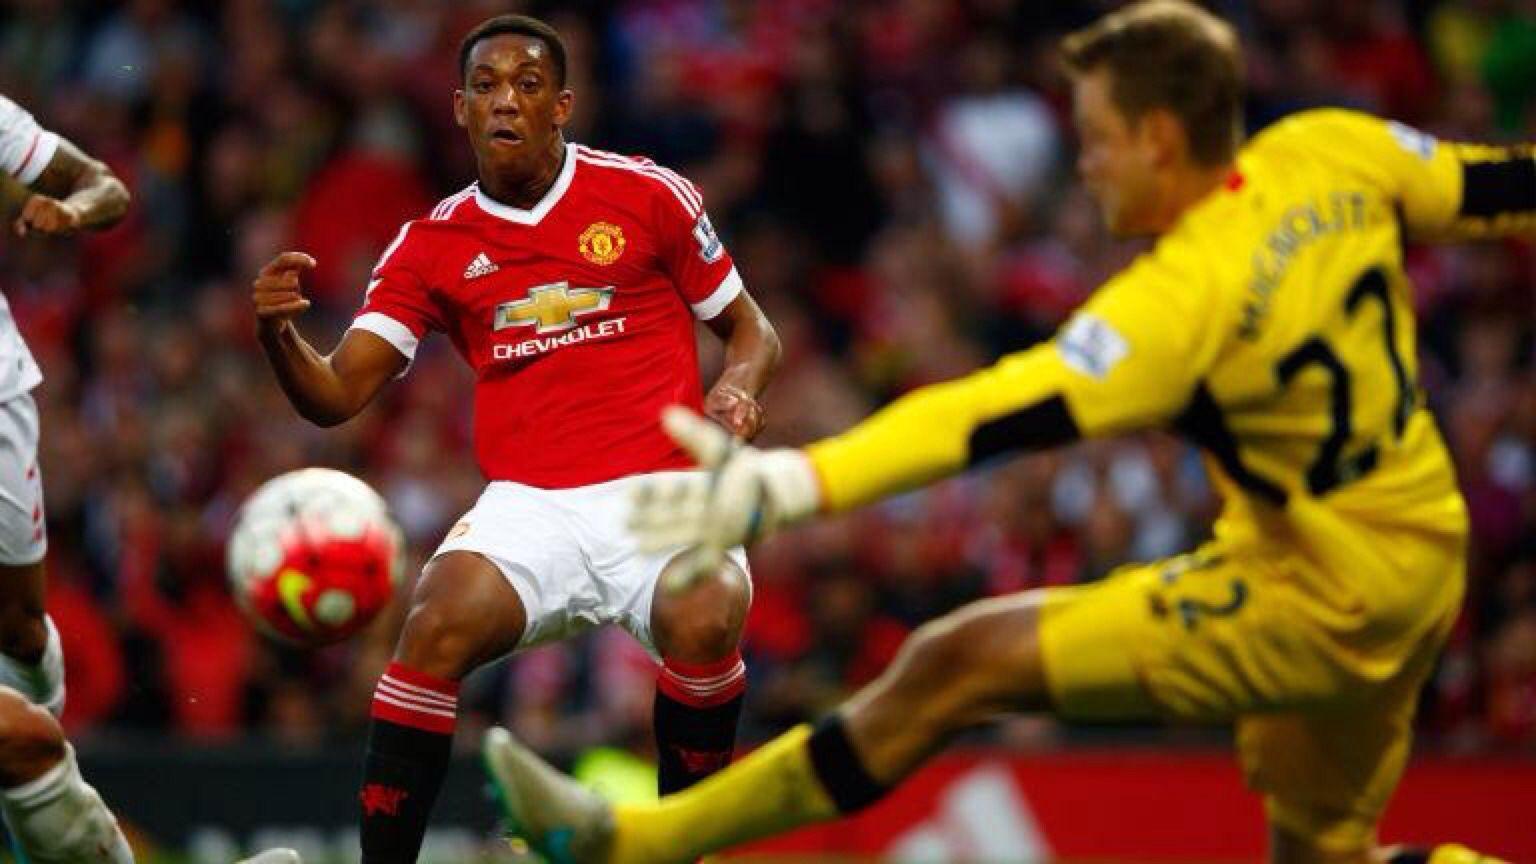 Martial Premier league, Sky sports football, Manchester